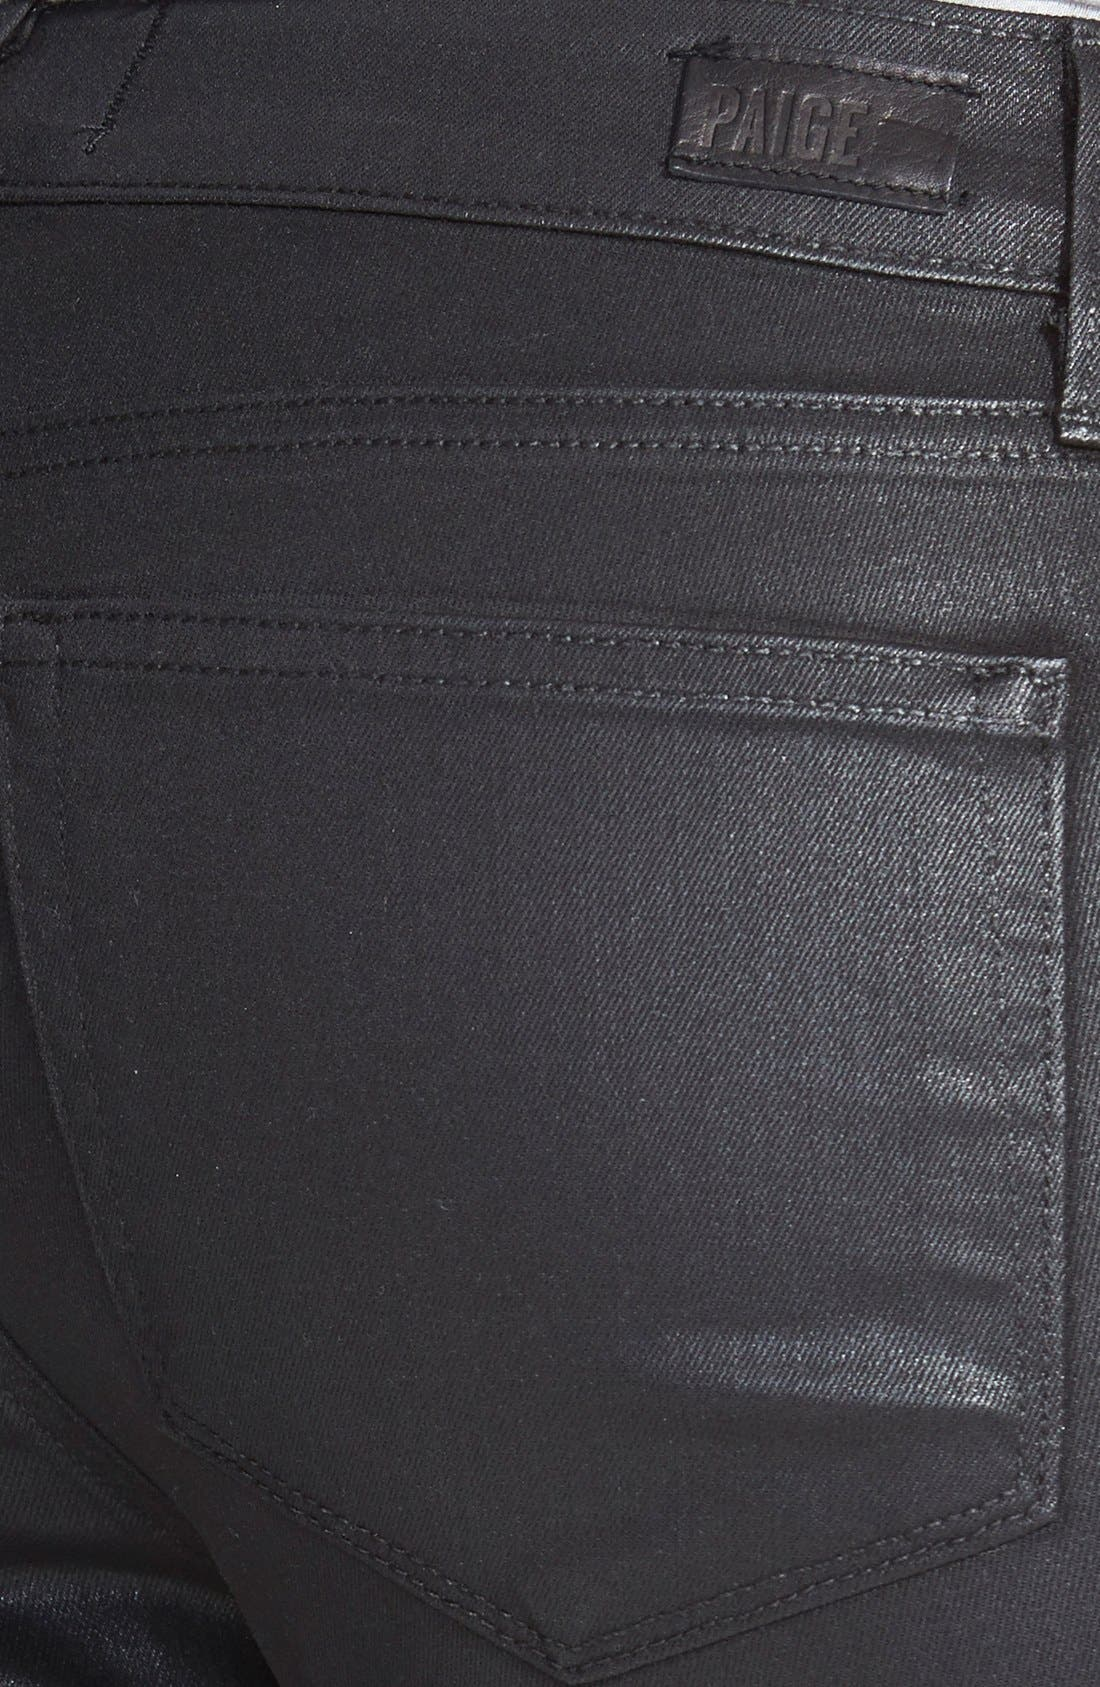 'Verdugo' Coated Ultra Skinny Ankle Jeans,                             Alternate thumbnail 3, color,                             001